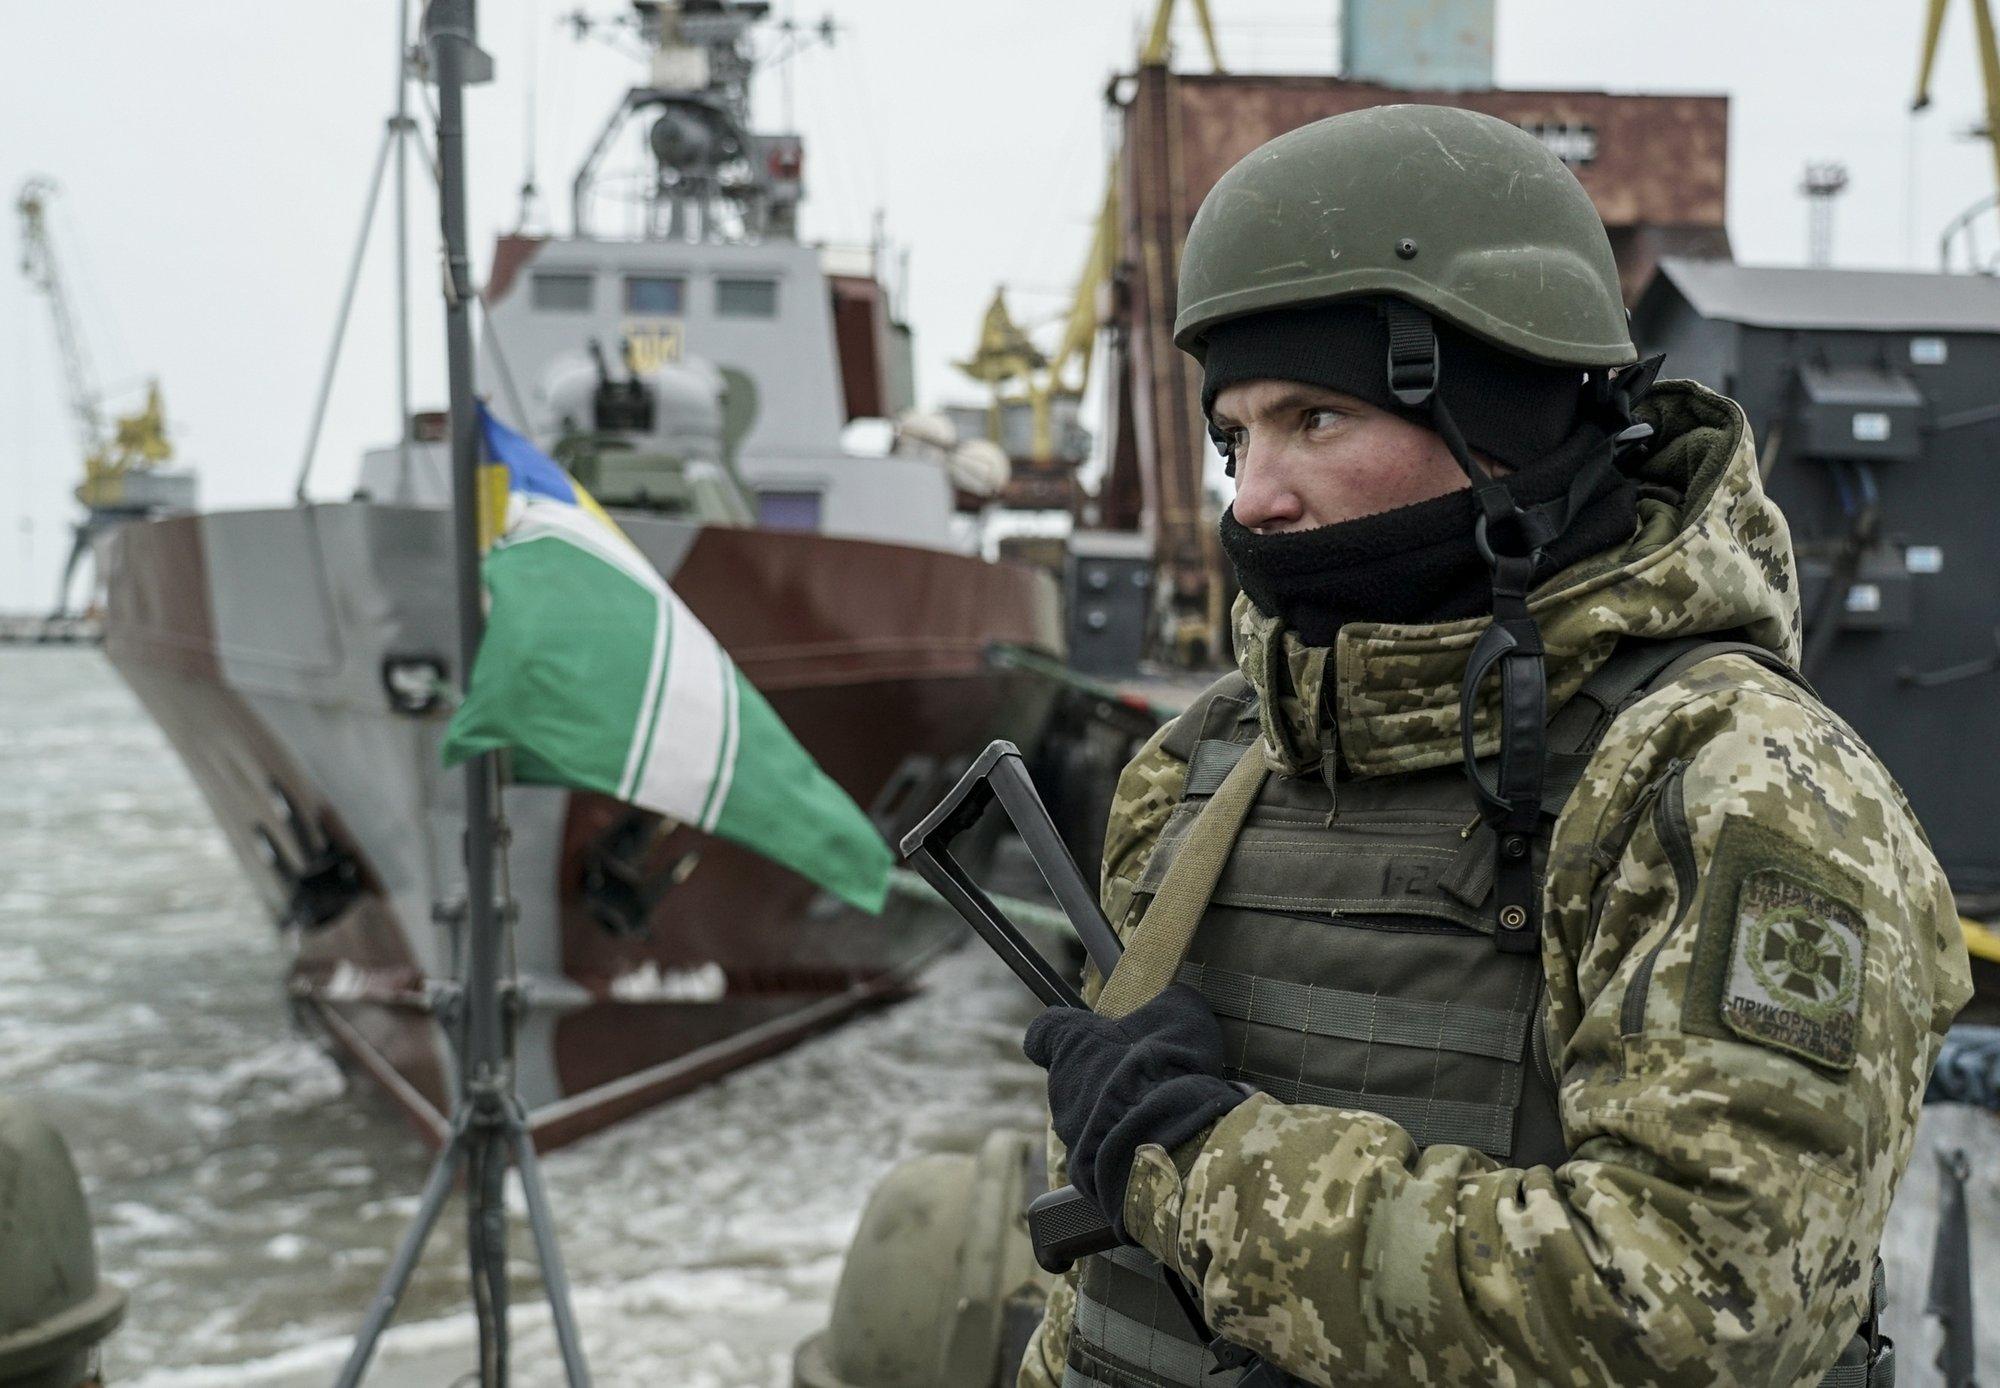 Russian Duma condemns Ukraine's 'destructive activities' over Kerch Strait standoff